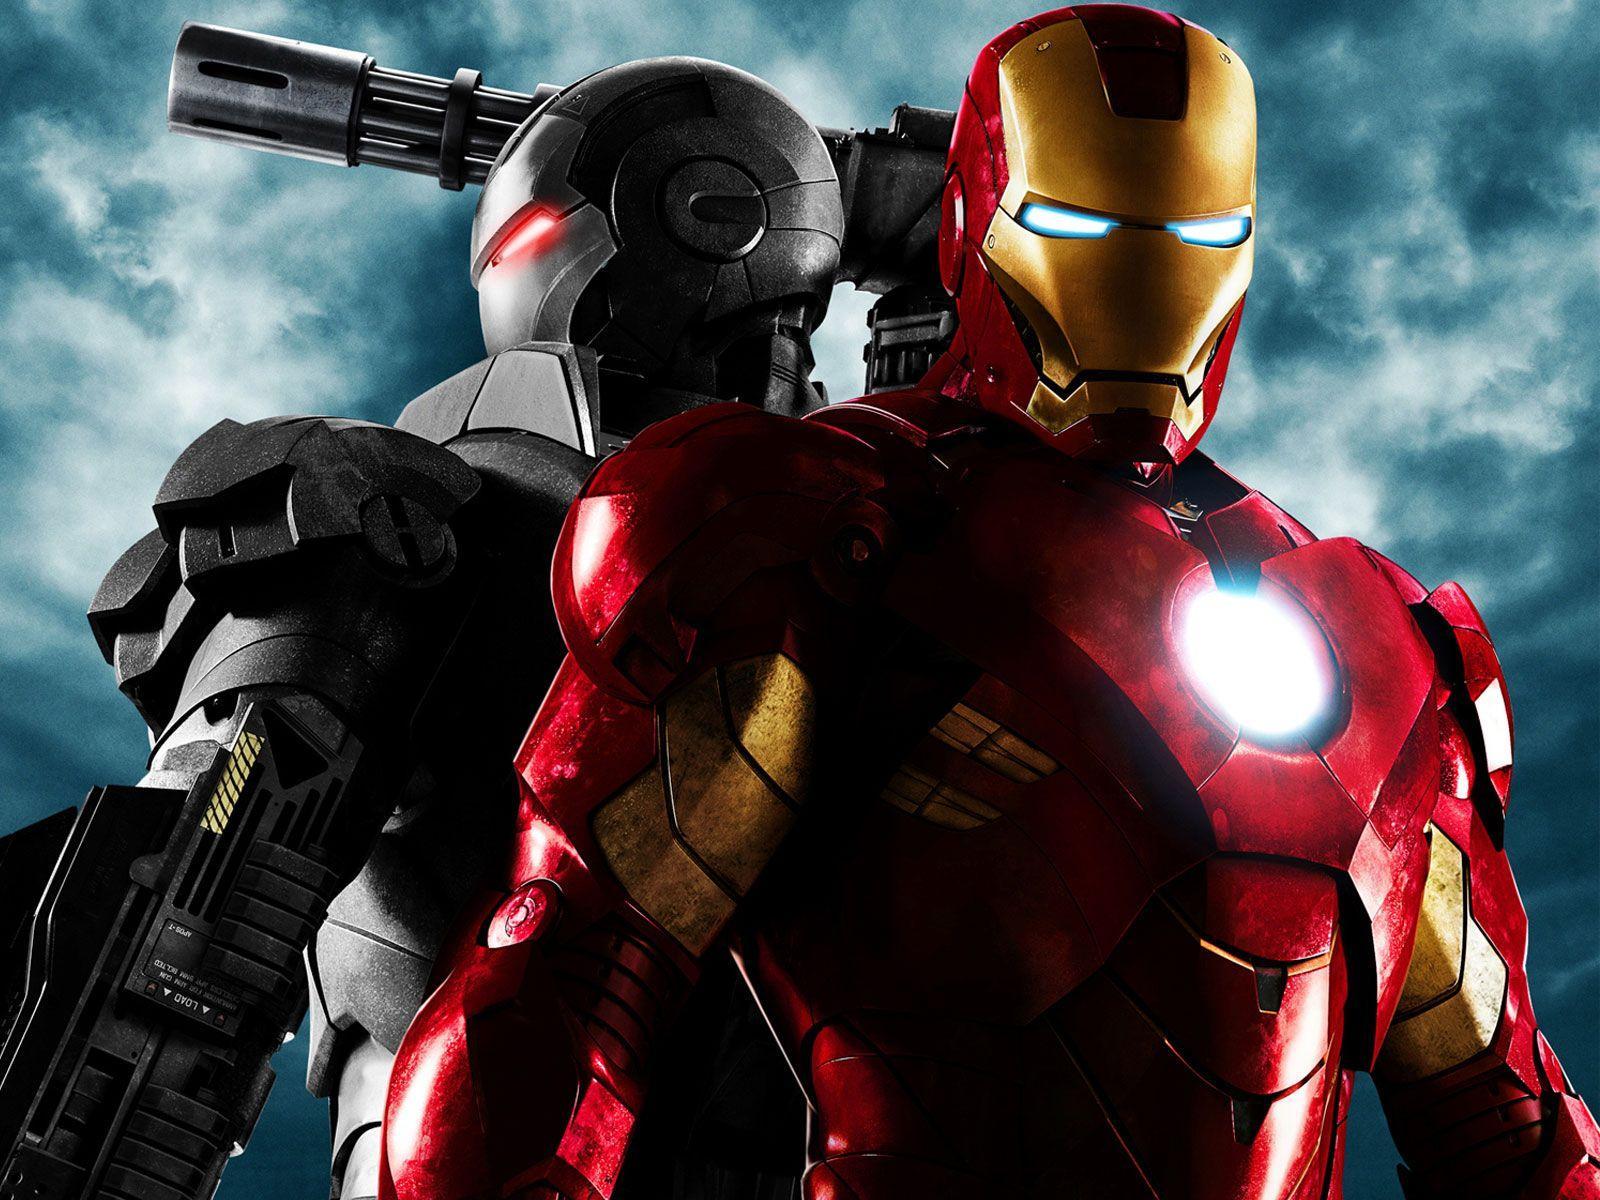 Iron Man HD Wallpaper Background Image x ID